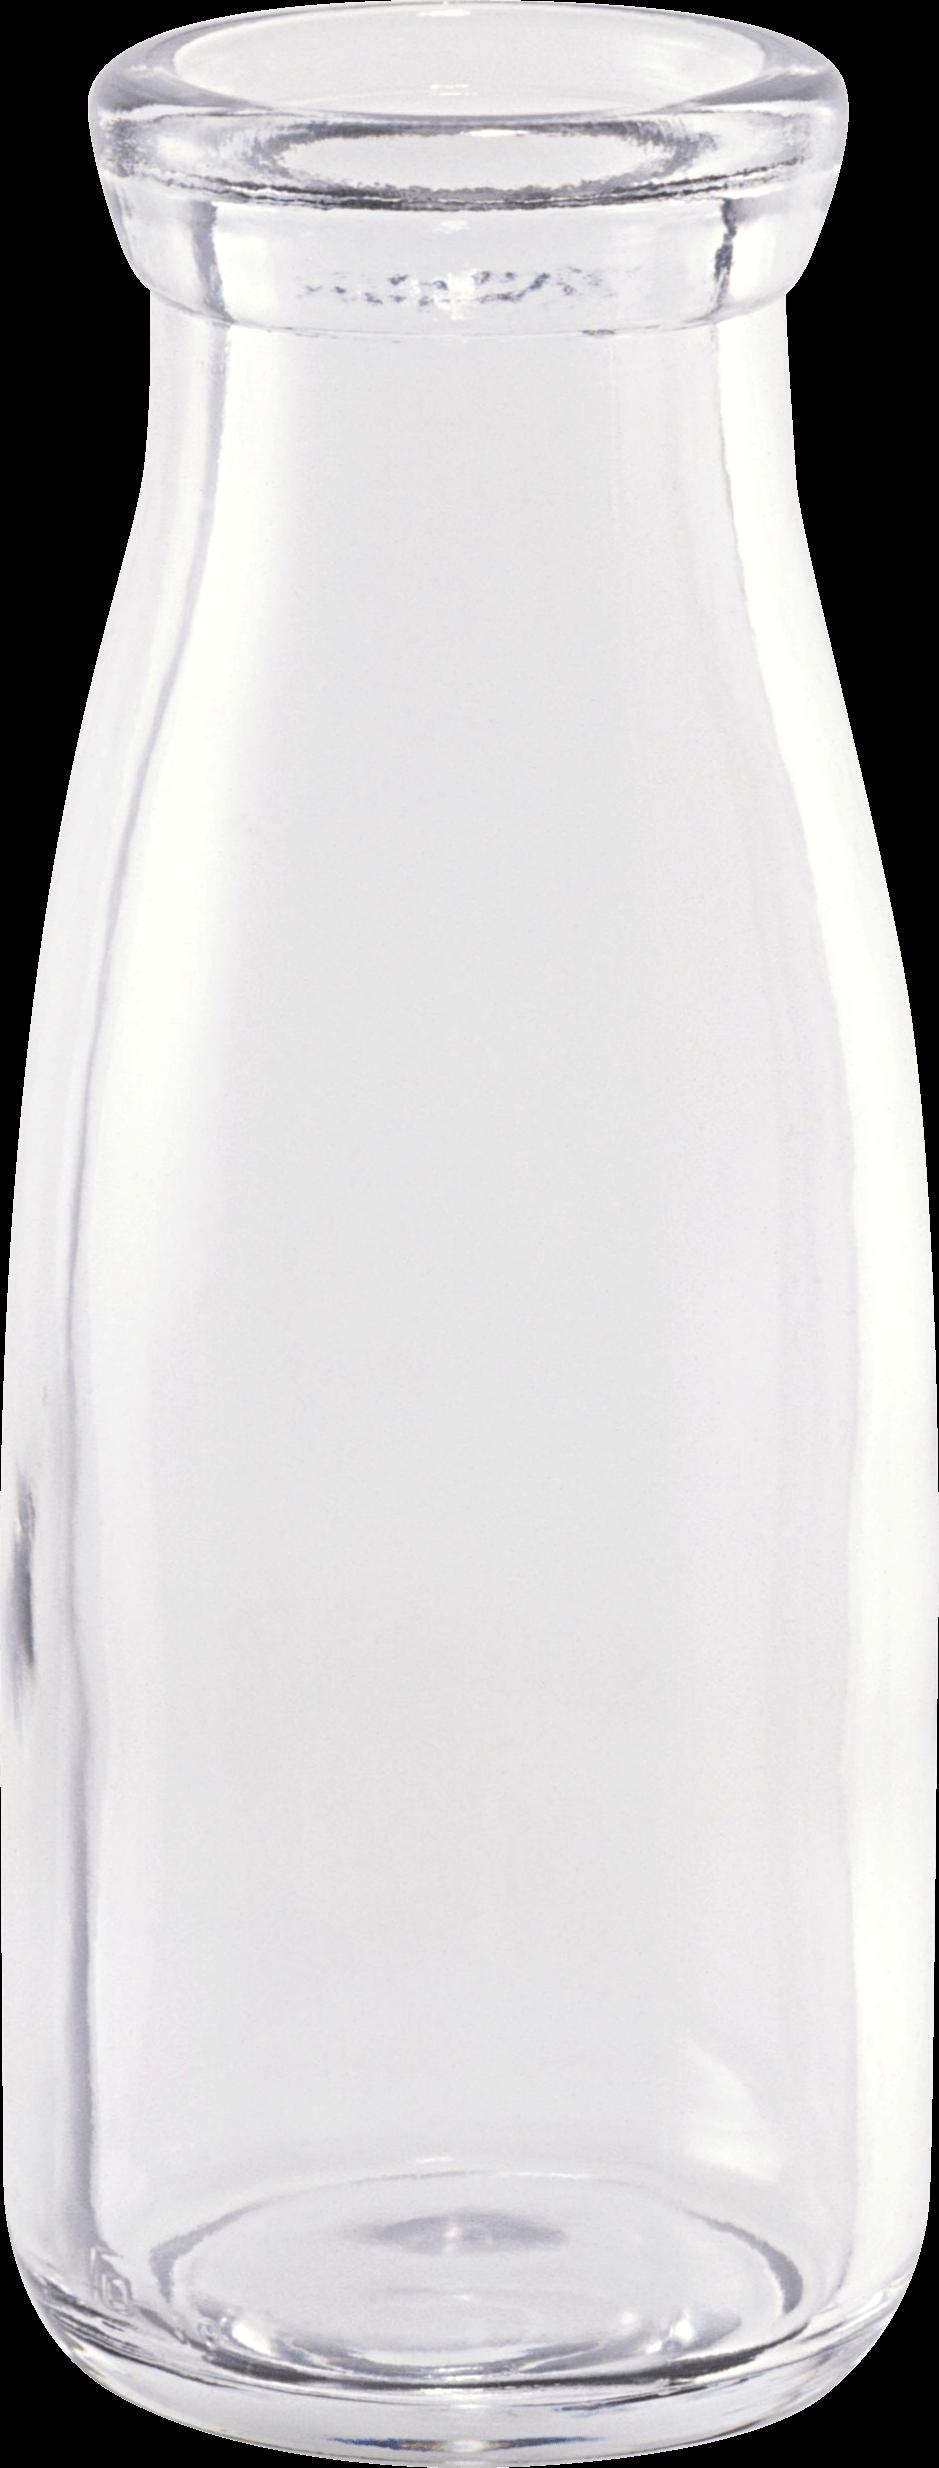 Bottle transparent png stickpng. Milk clipart empty glass